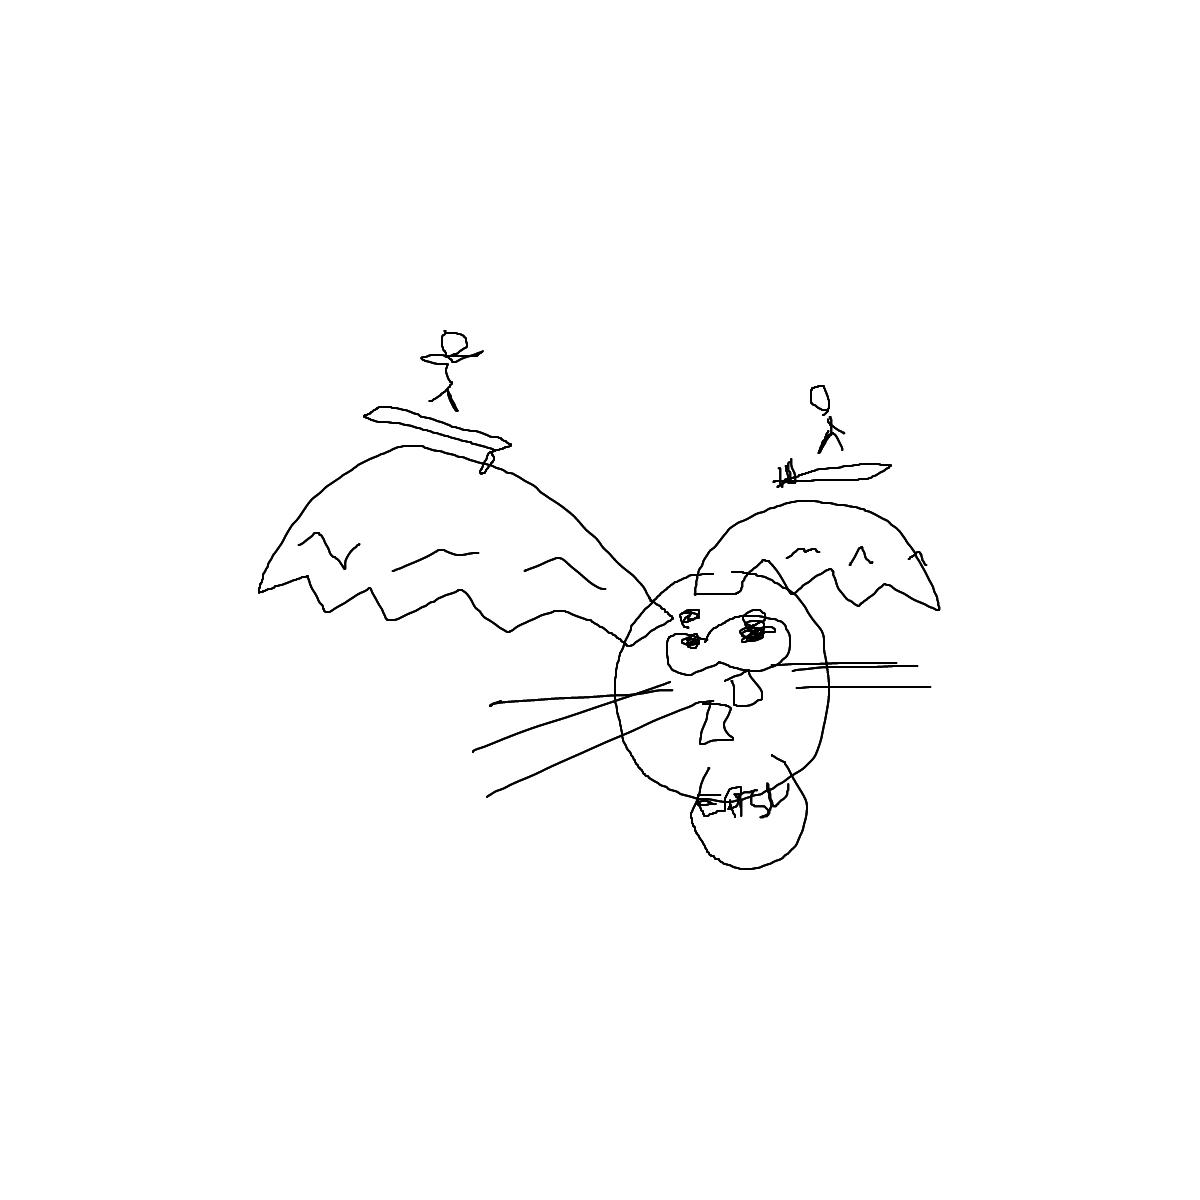 BAAAM drawing#3406 lat:38.3976440429687500lng: -26.6308593750000000